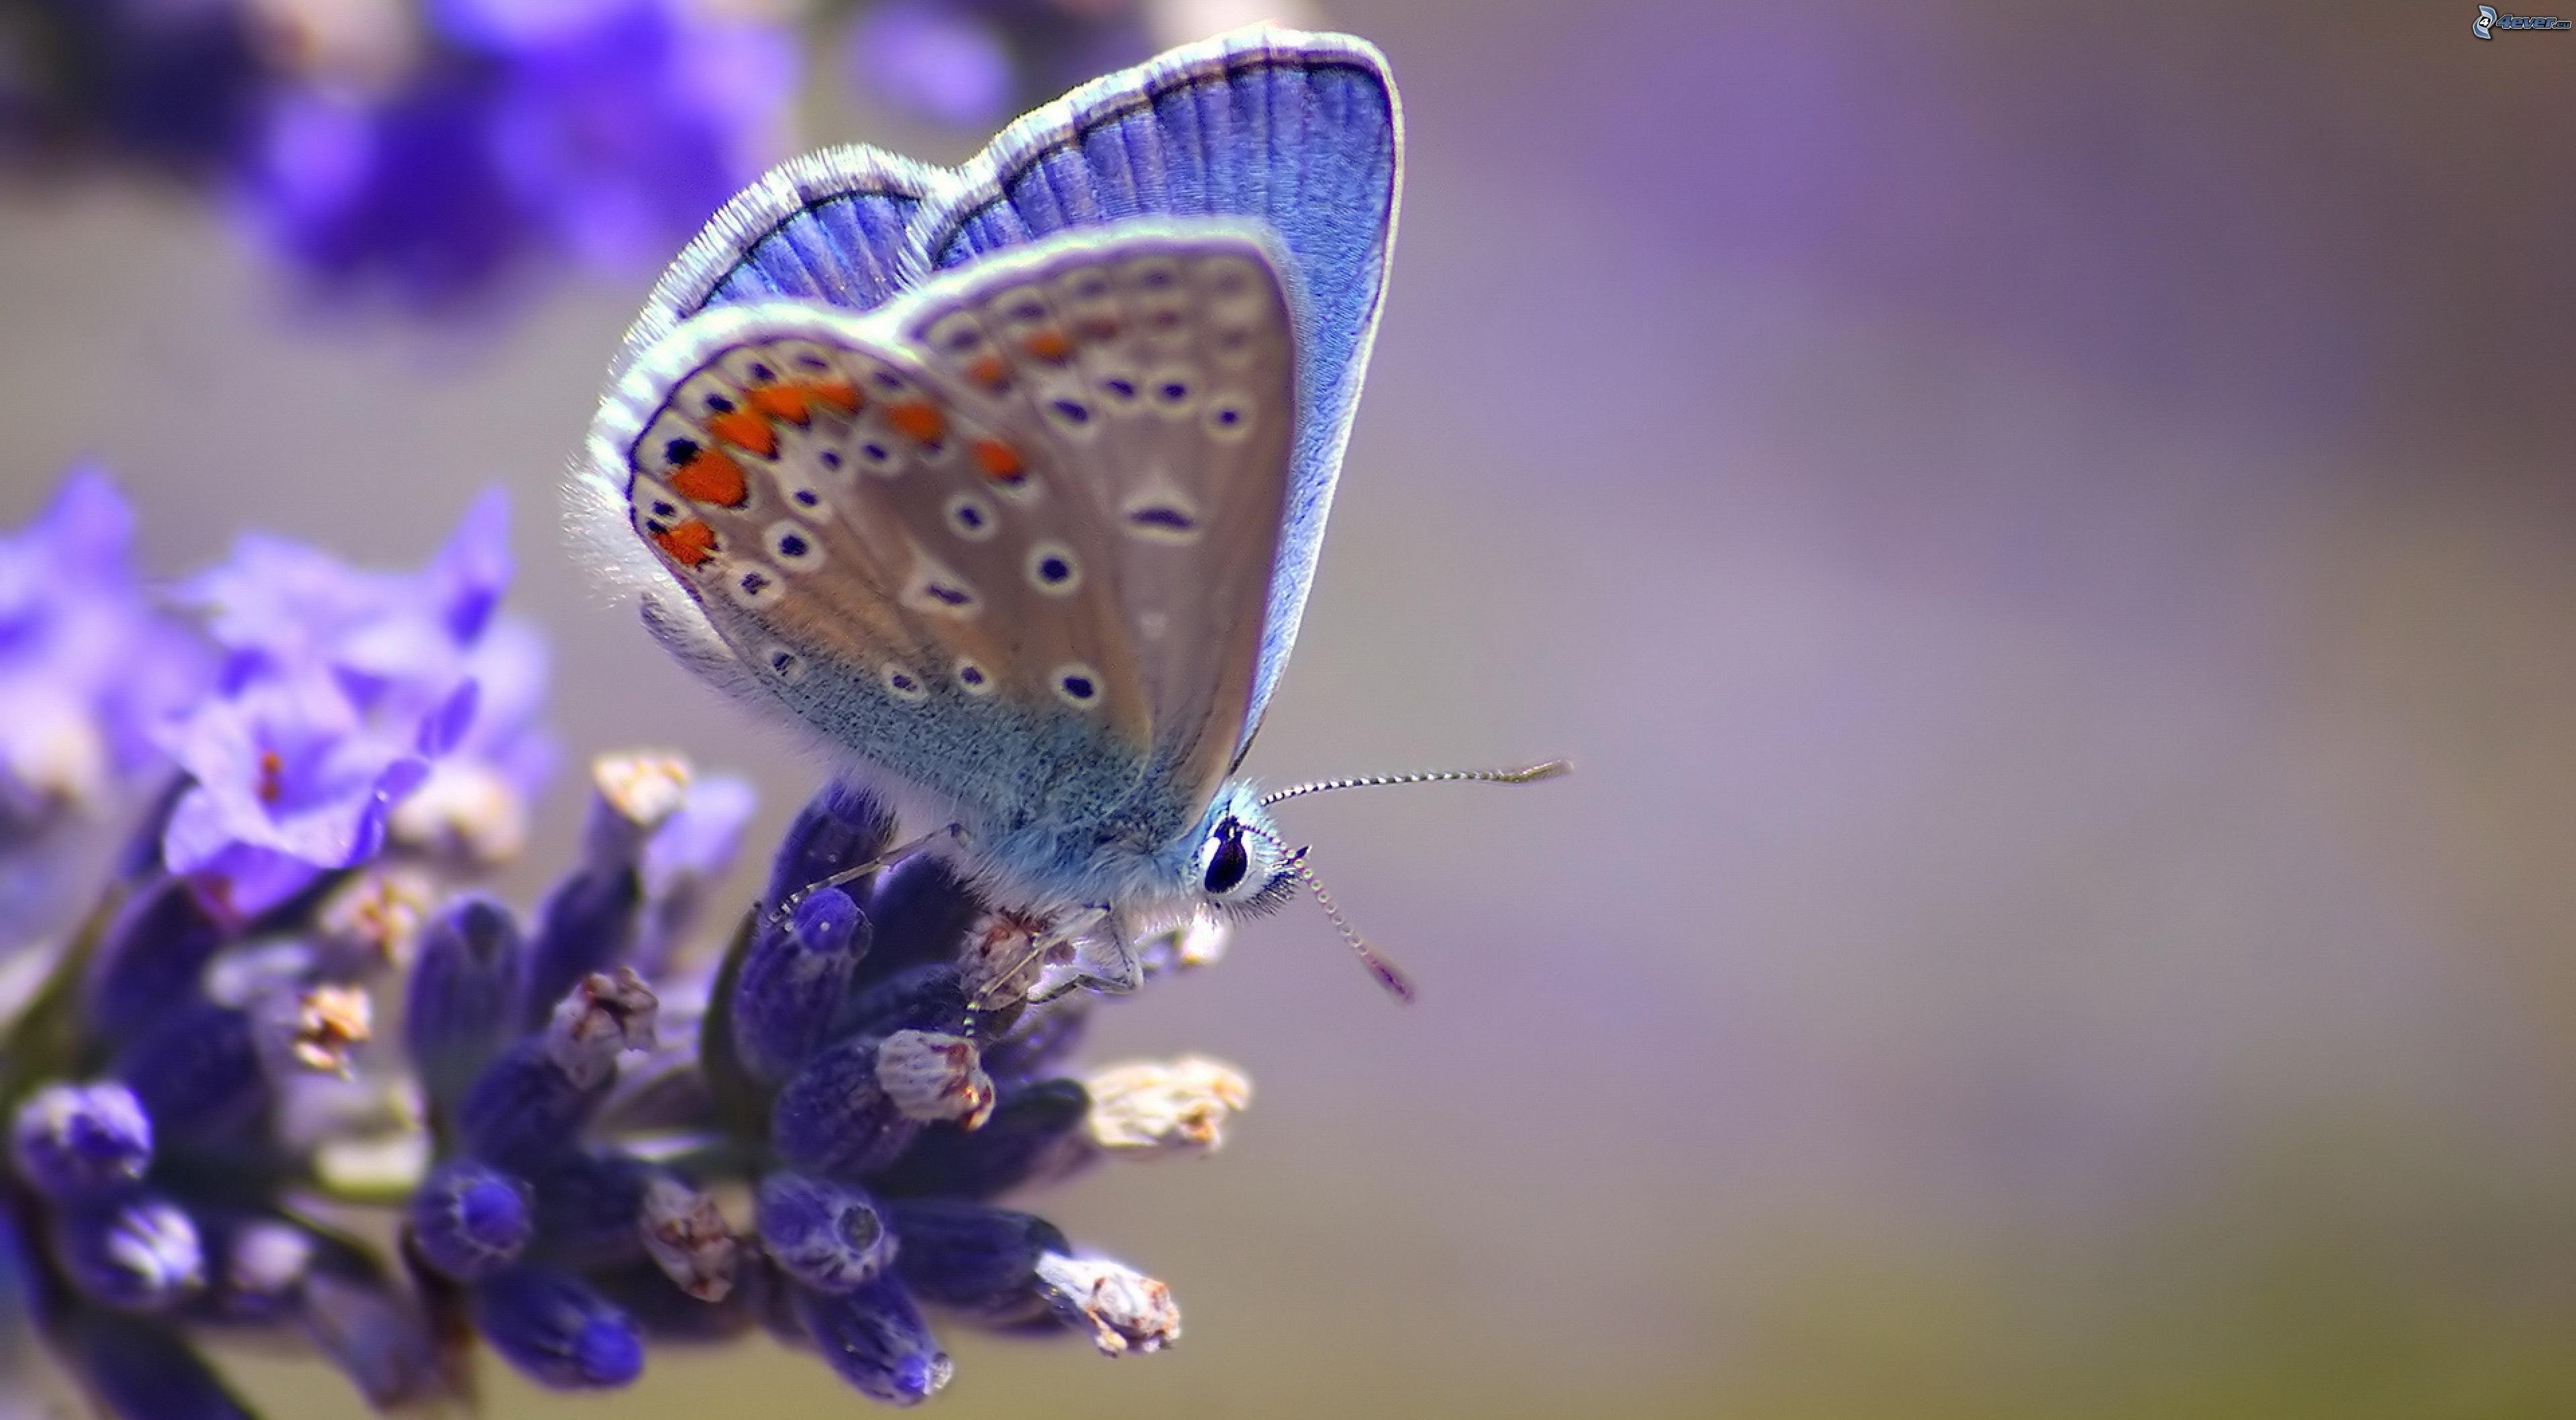 papillon-bleu,-fleur-bleue